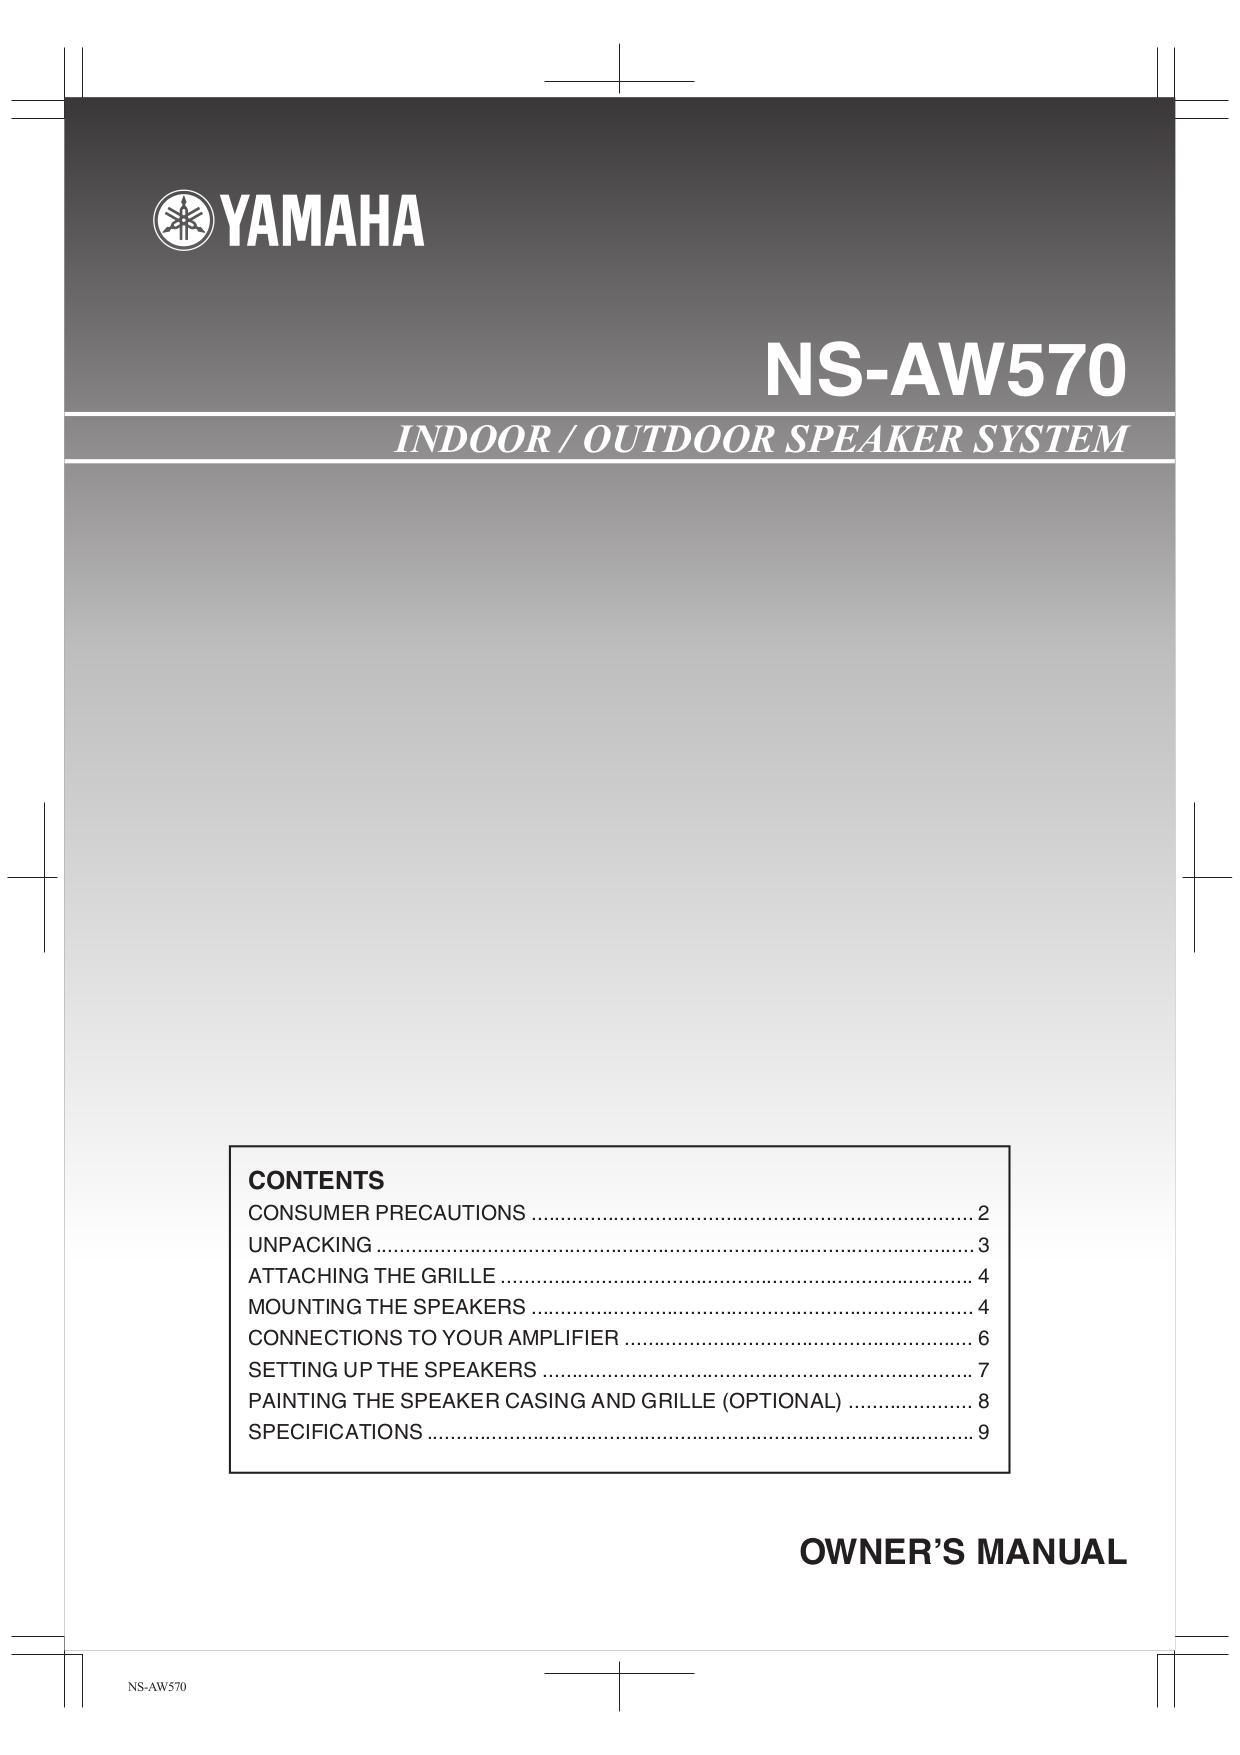 watercad manual pdf free download